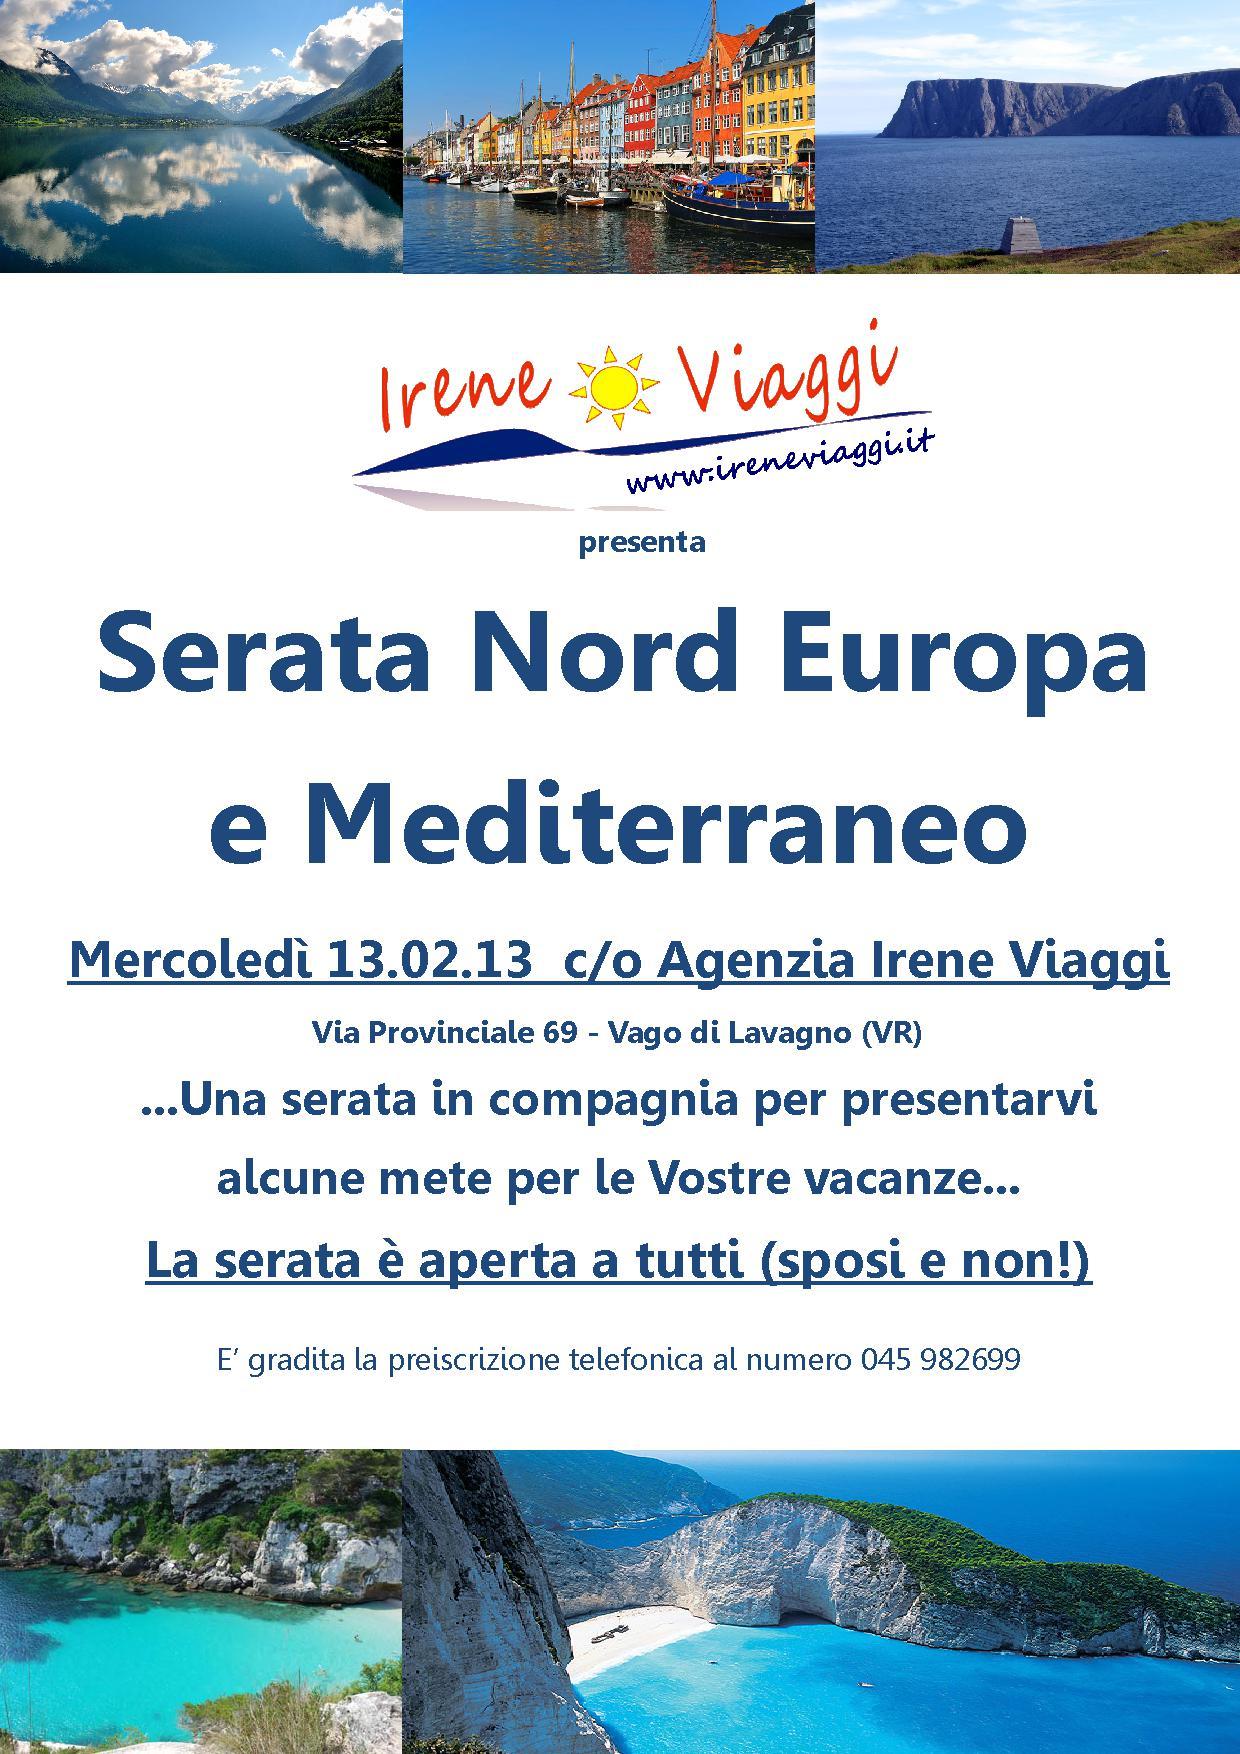 Serata Nord Europa e Mediterraneo